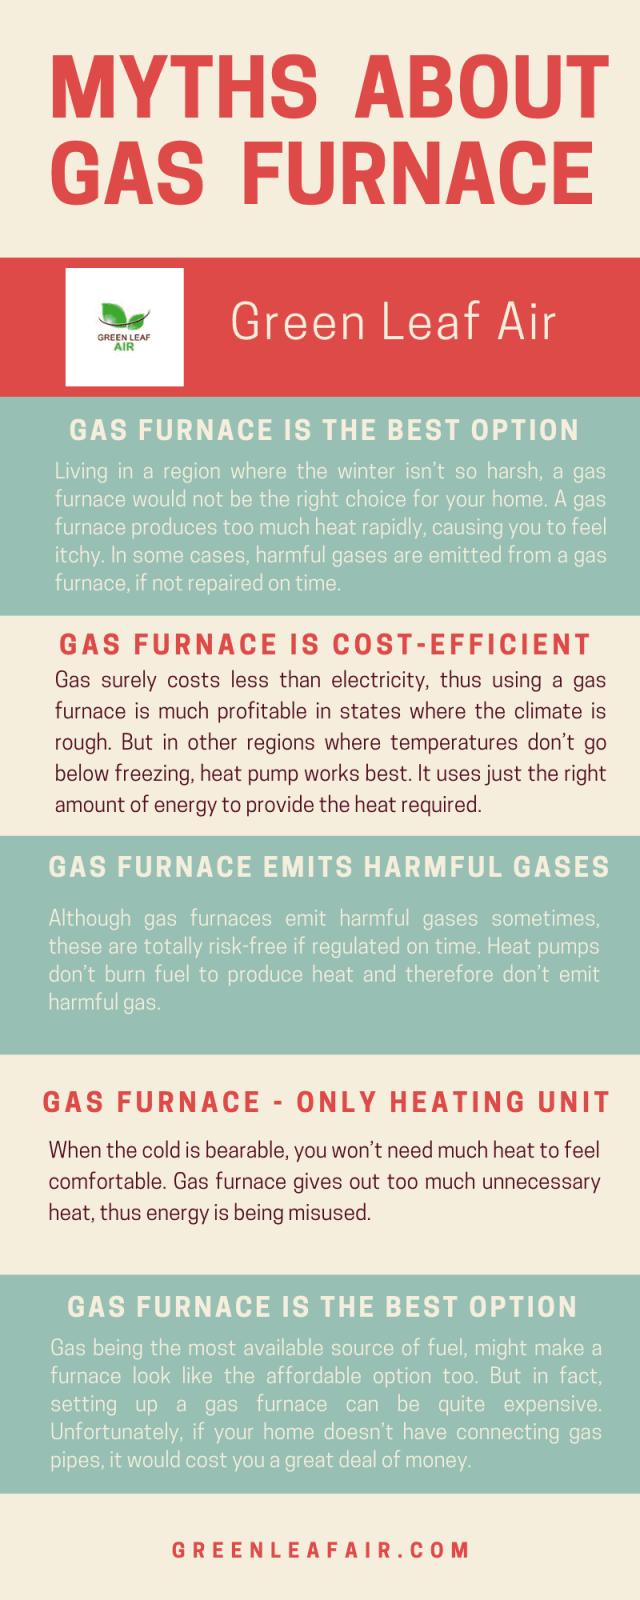 Myths About Gas Furnace